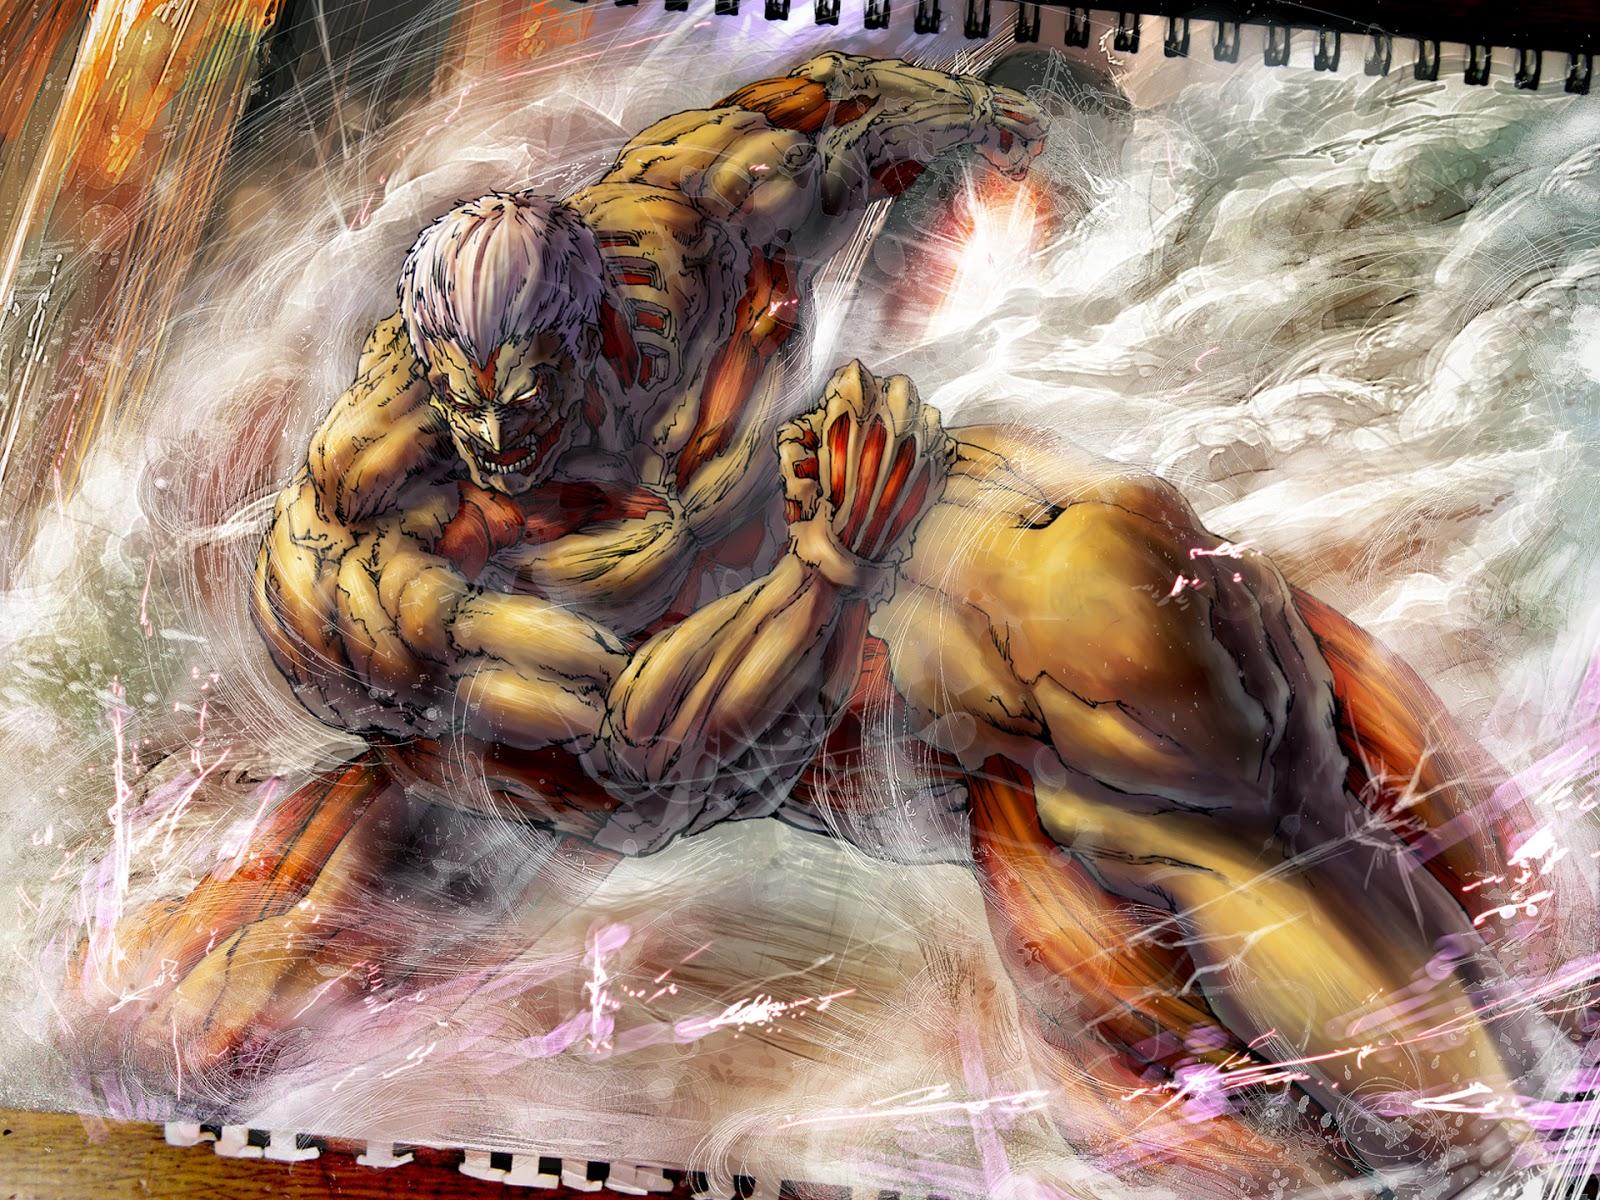 49 Attack On Titan Hd Wallpapers On Wallpapersafari